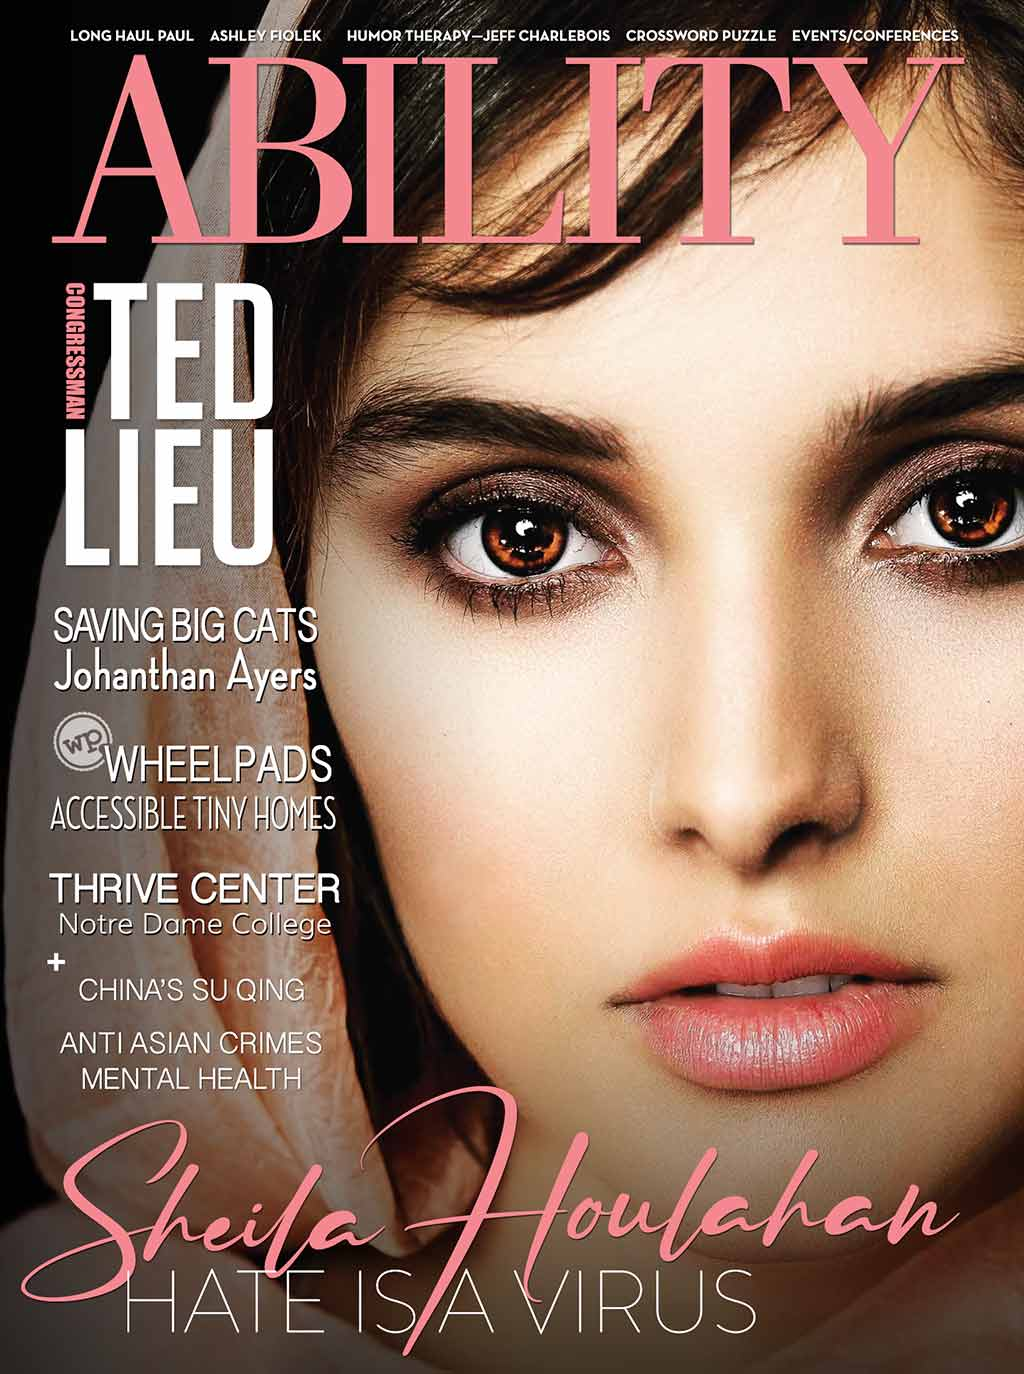 ABILITY Magazine Sheila Houlahan Cover